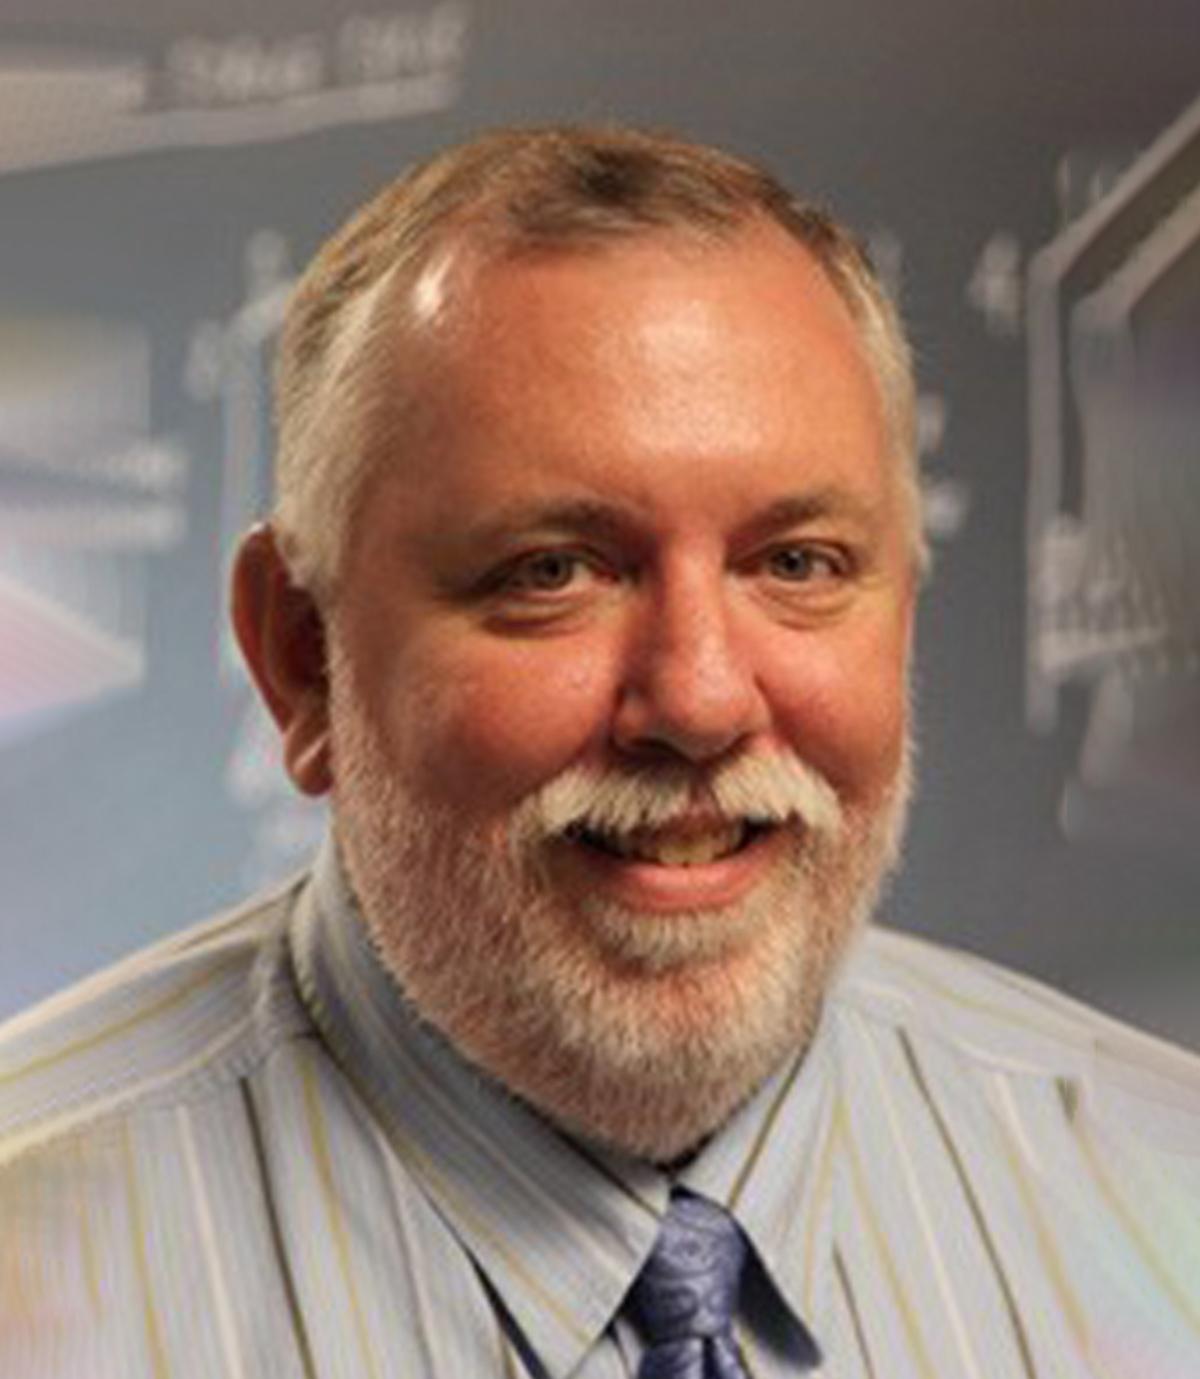 Stephen G. Magoc, Professor, Department of Aviation Science, at SLU